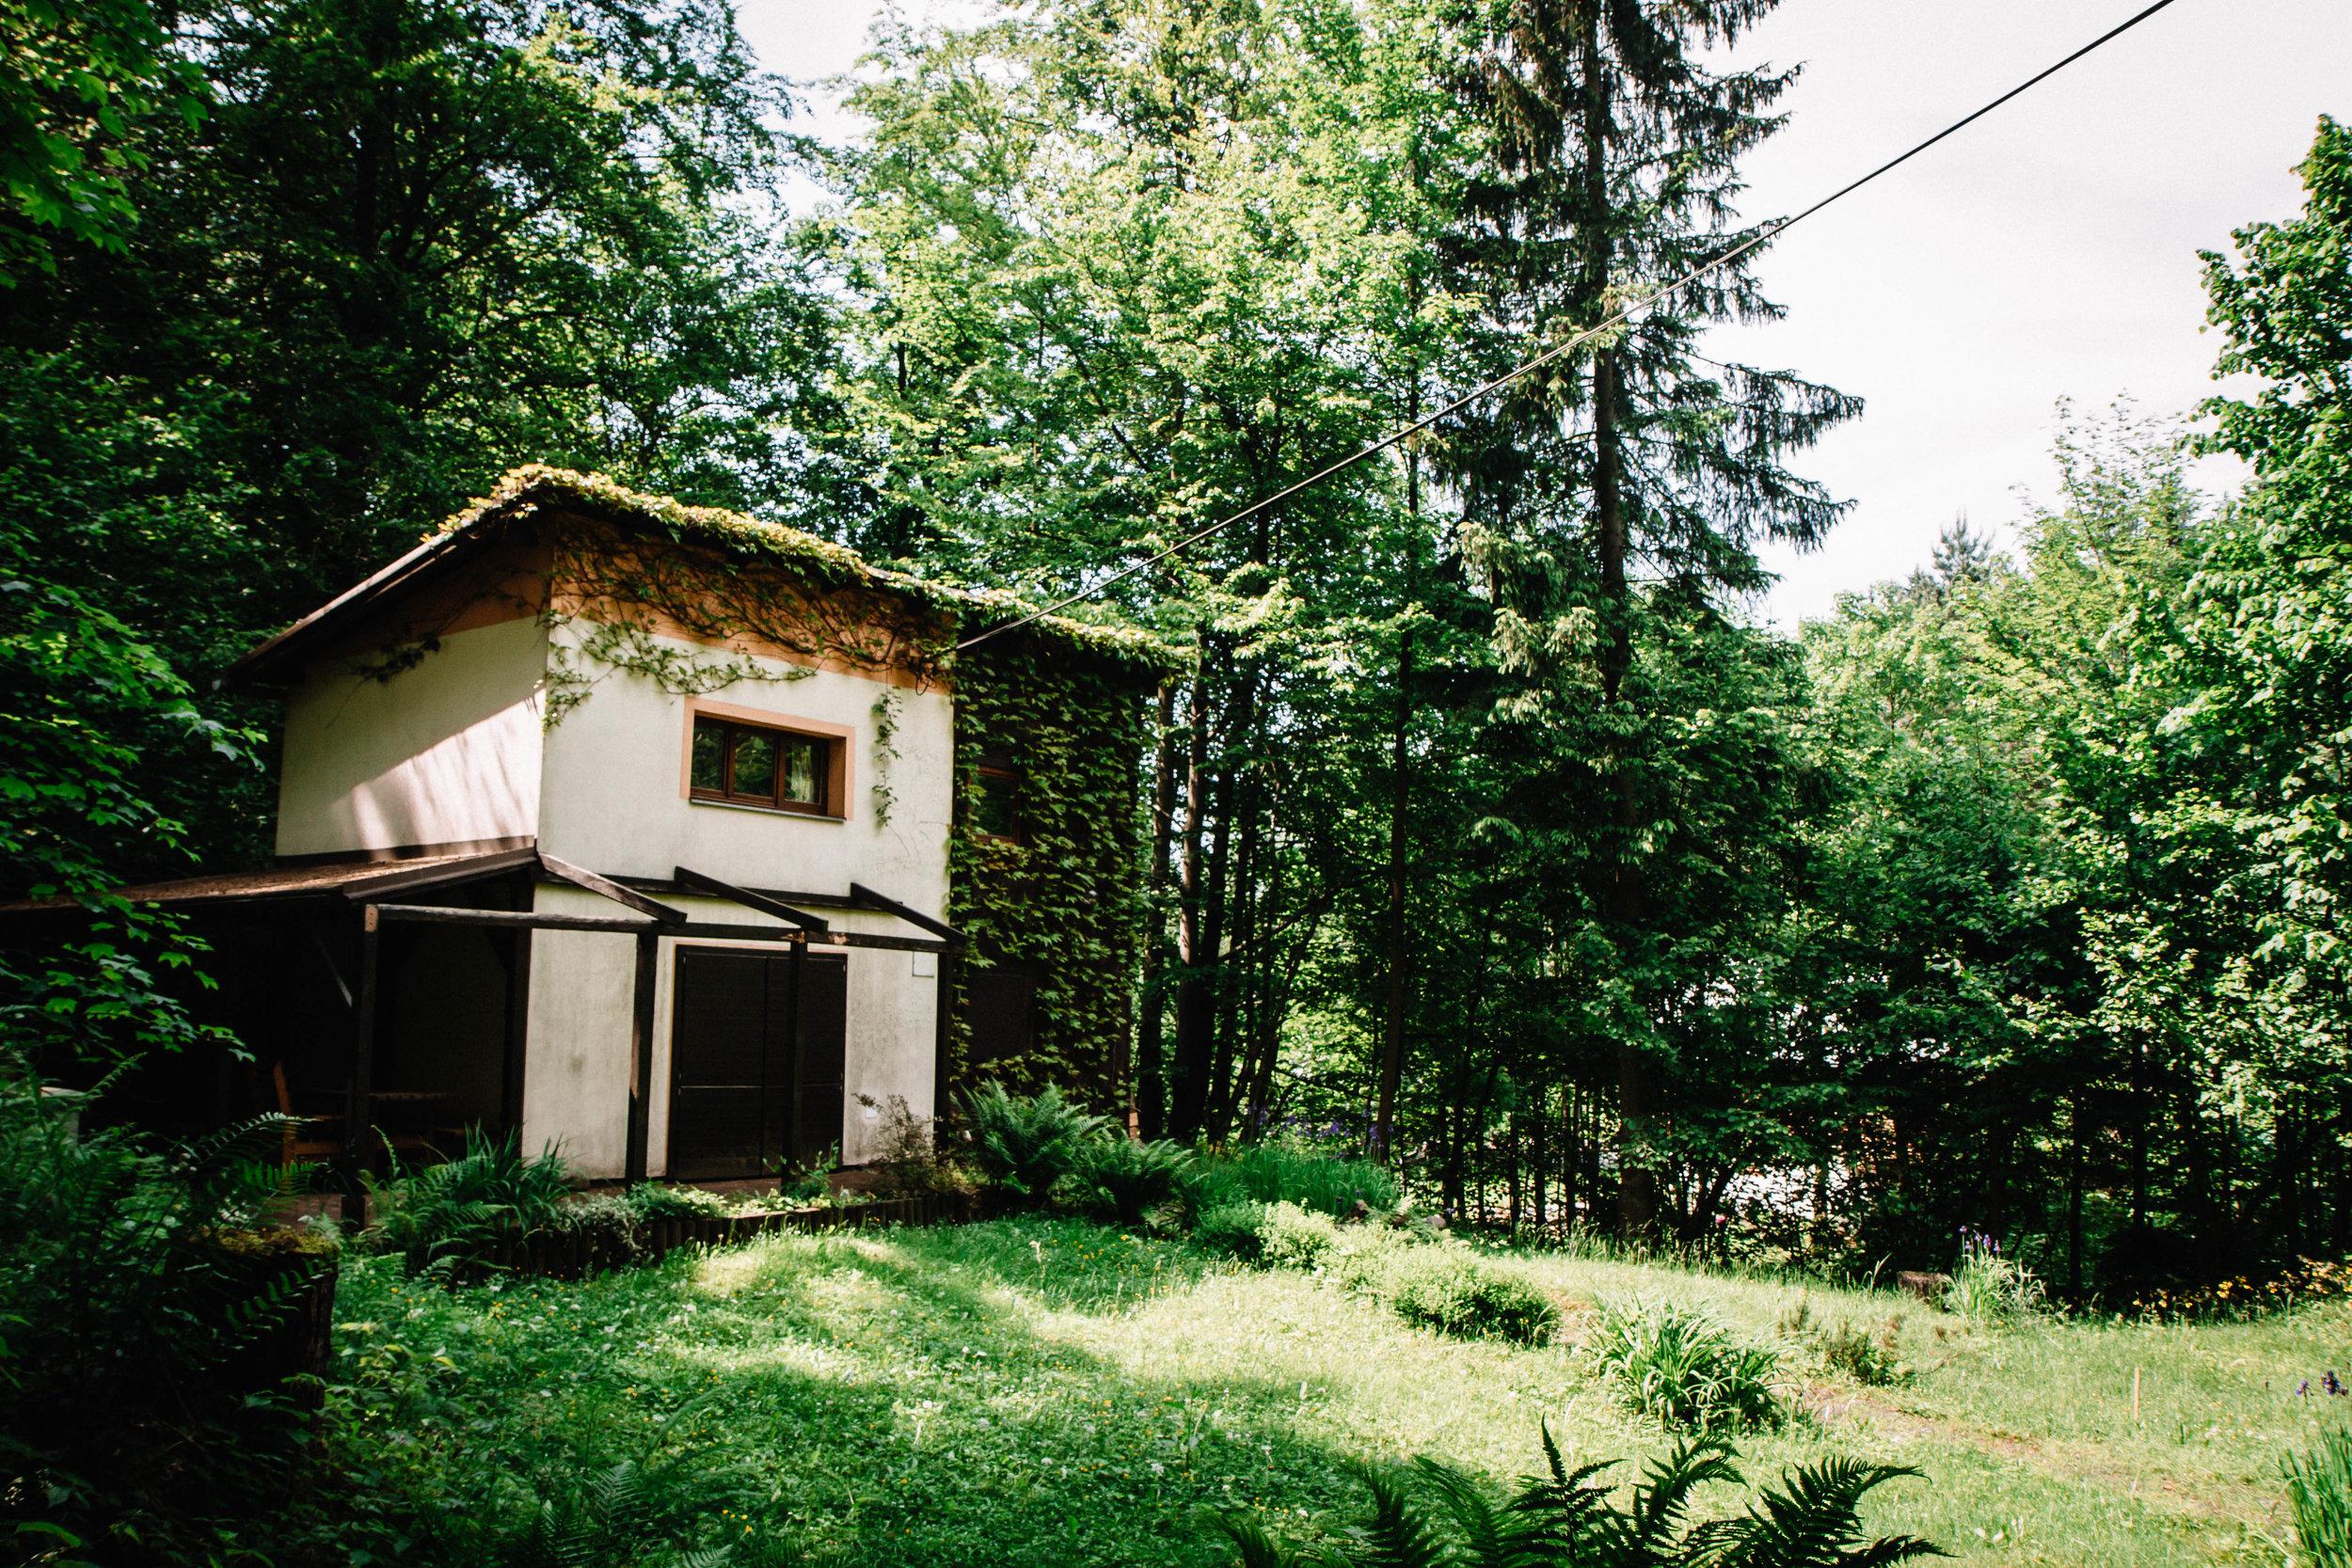 Malenovice, Czech Republic